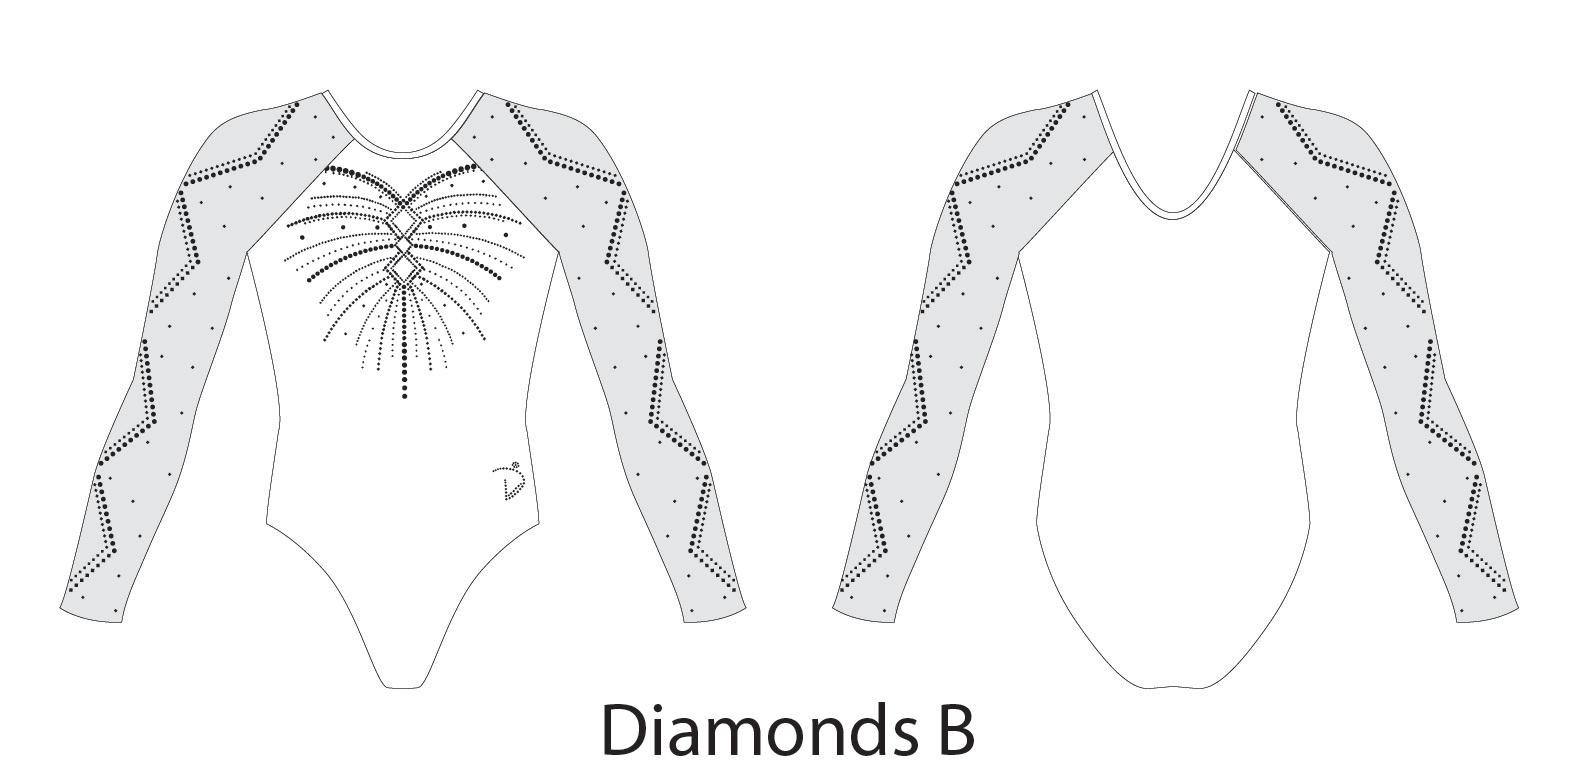 Diamonds B